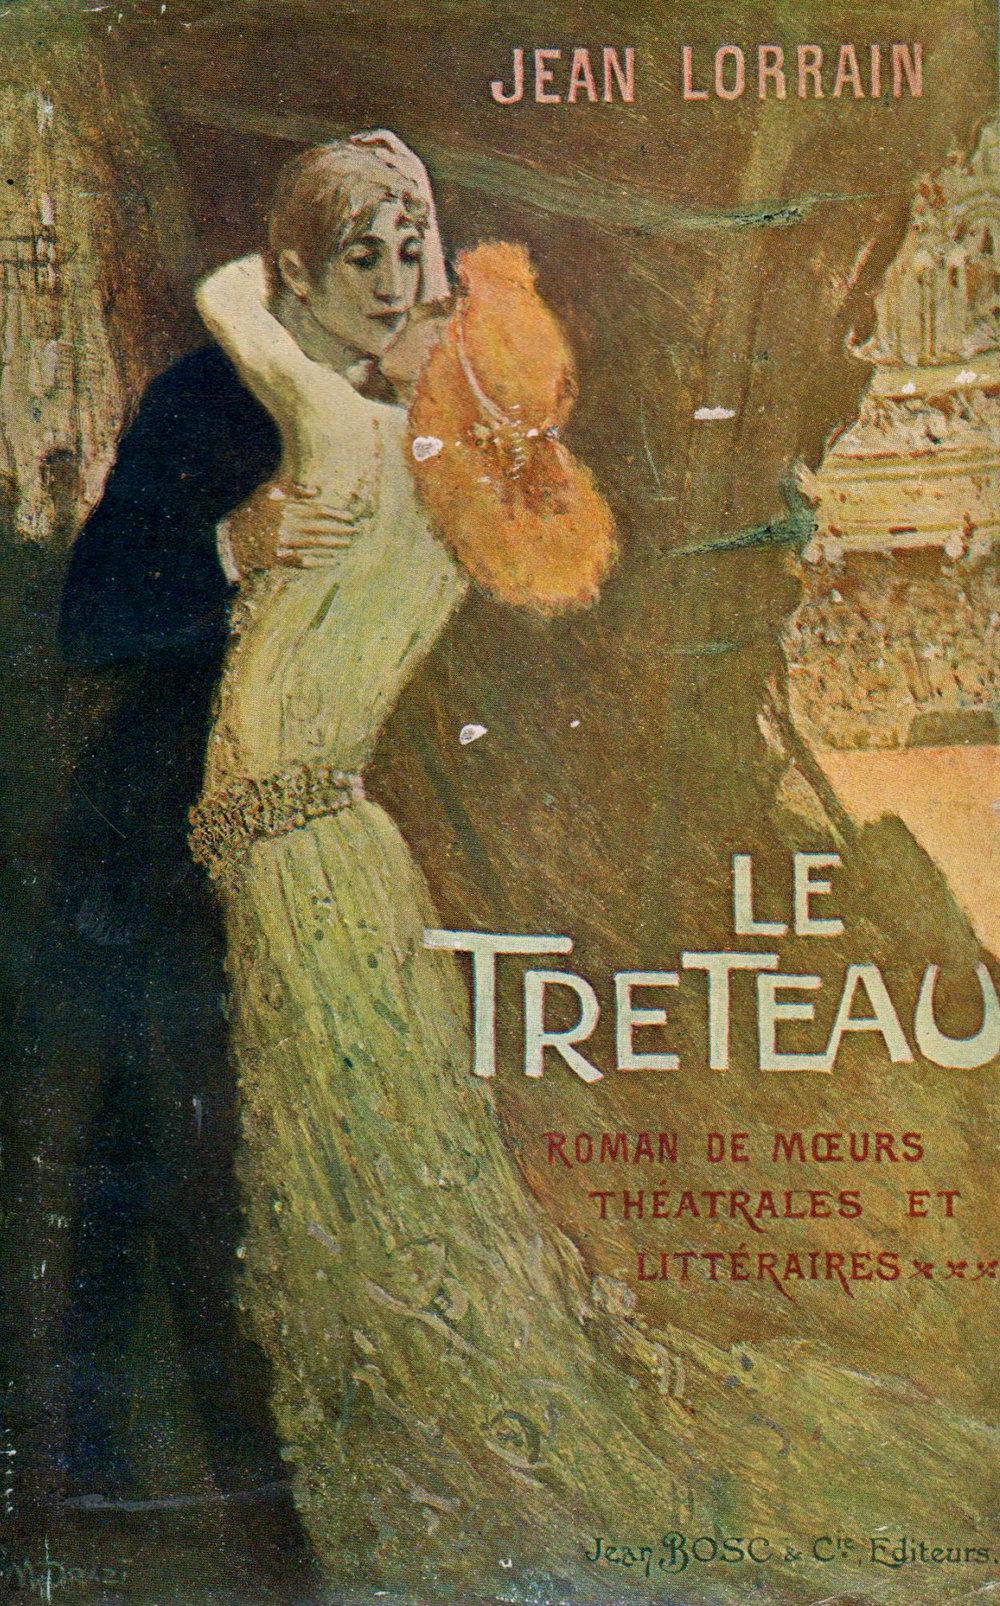 Le Tréteau, de Jean Lorrain.